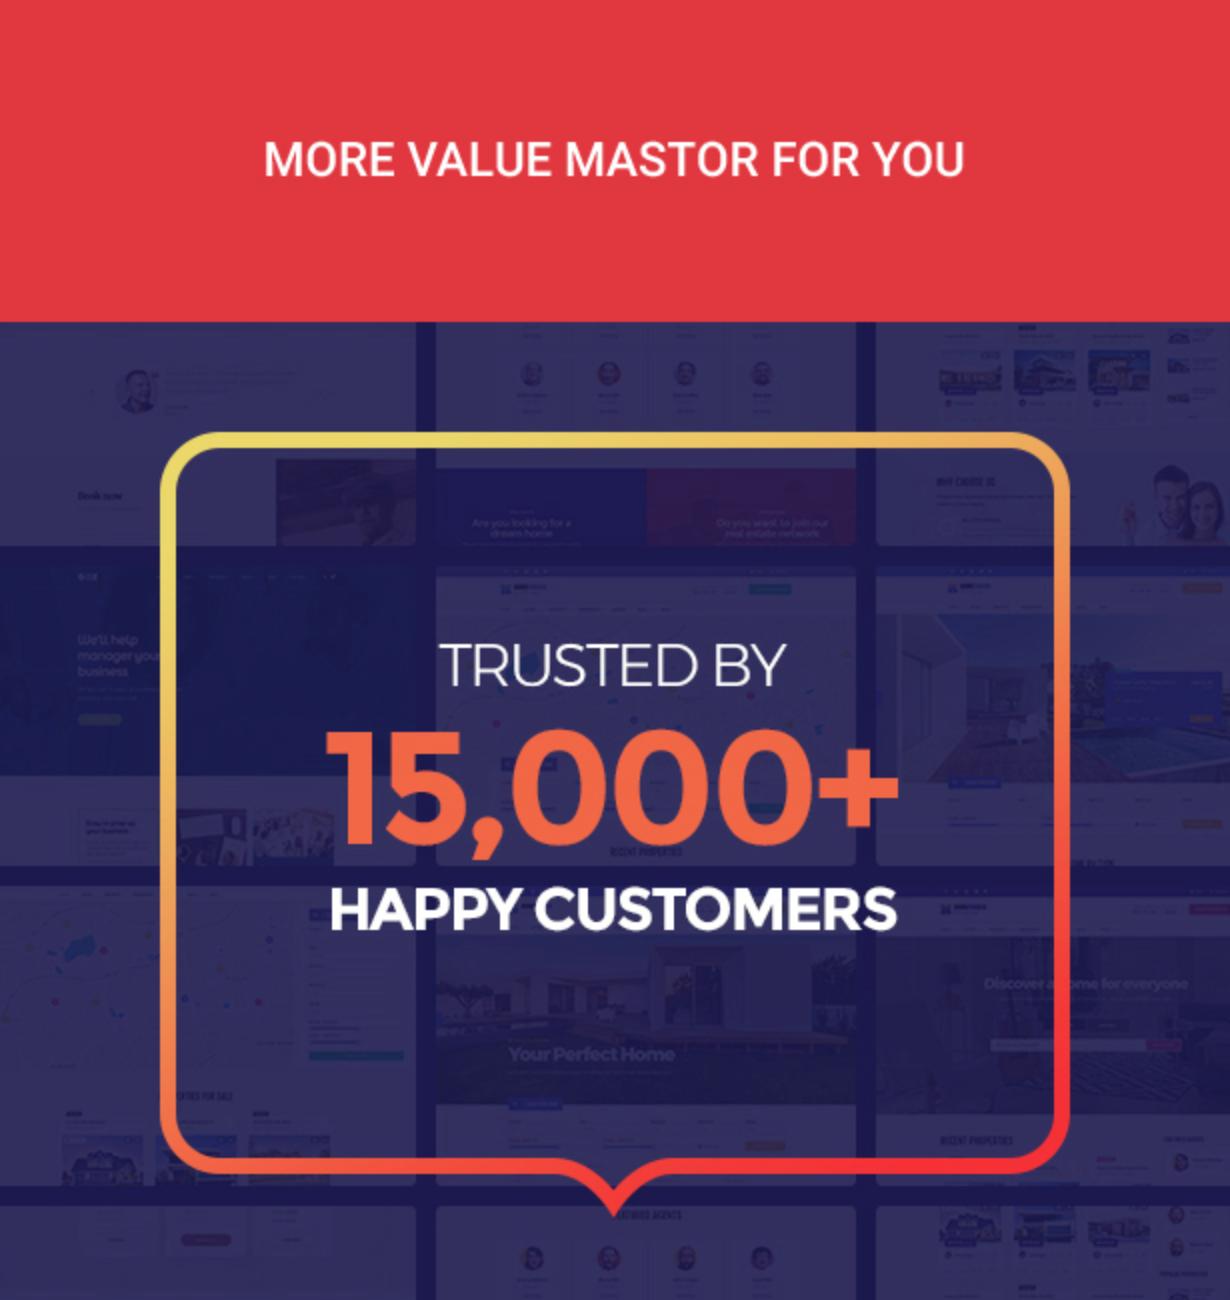 Mastor - Law, Firm & Legal Attorney WordPress Theme Customer Review